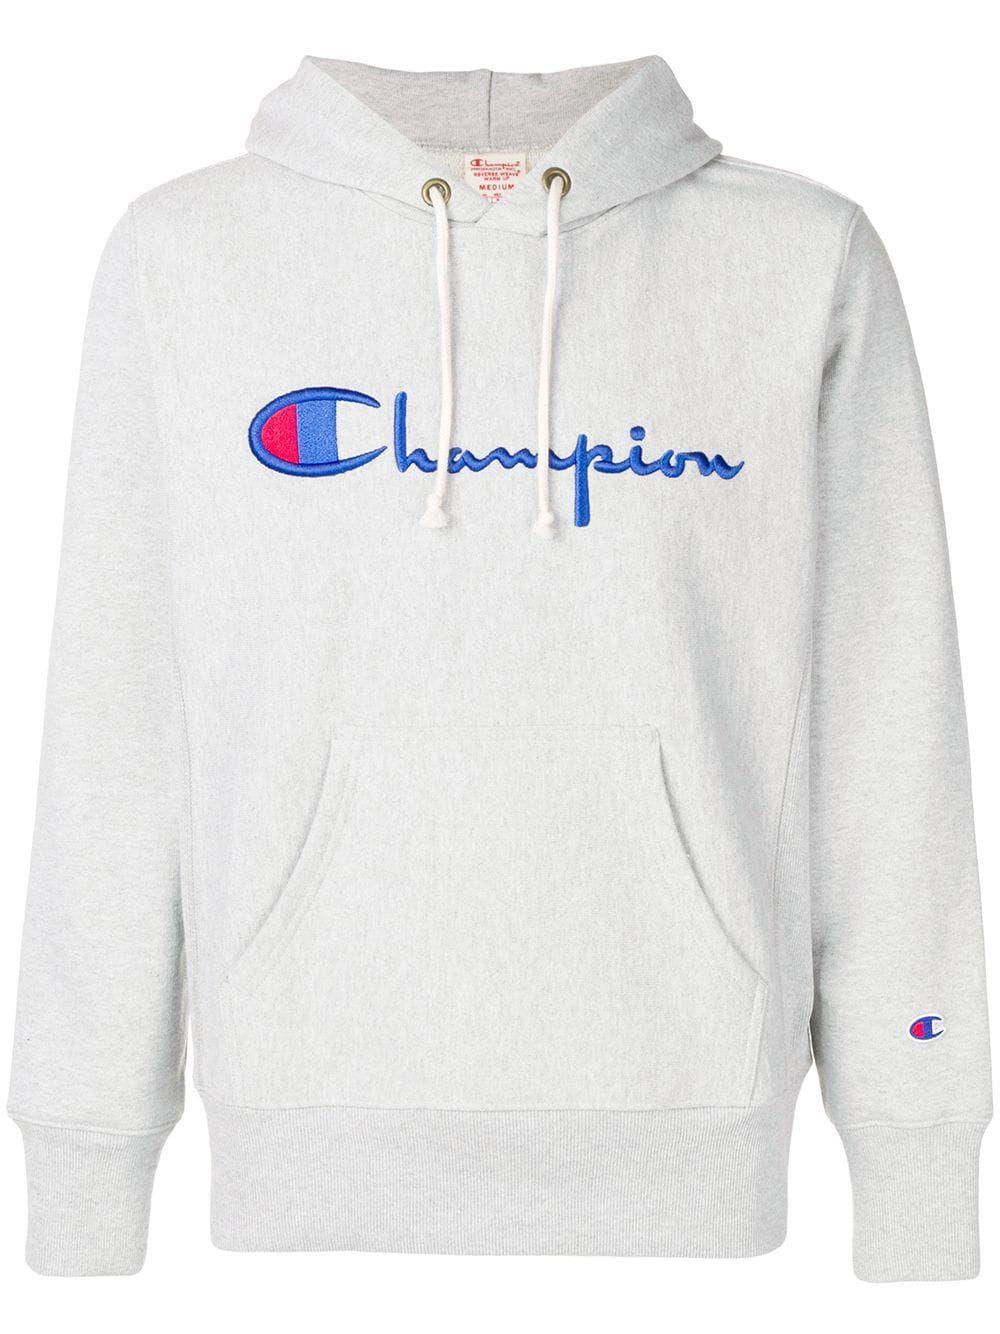 Champion Embroidered Logo Hoodie Farfetch Hoodies Champion Hoodie Women Hoodie Outfit Men [ 1334 x 1000 Pixel ]